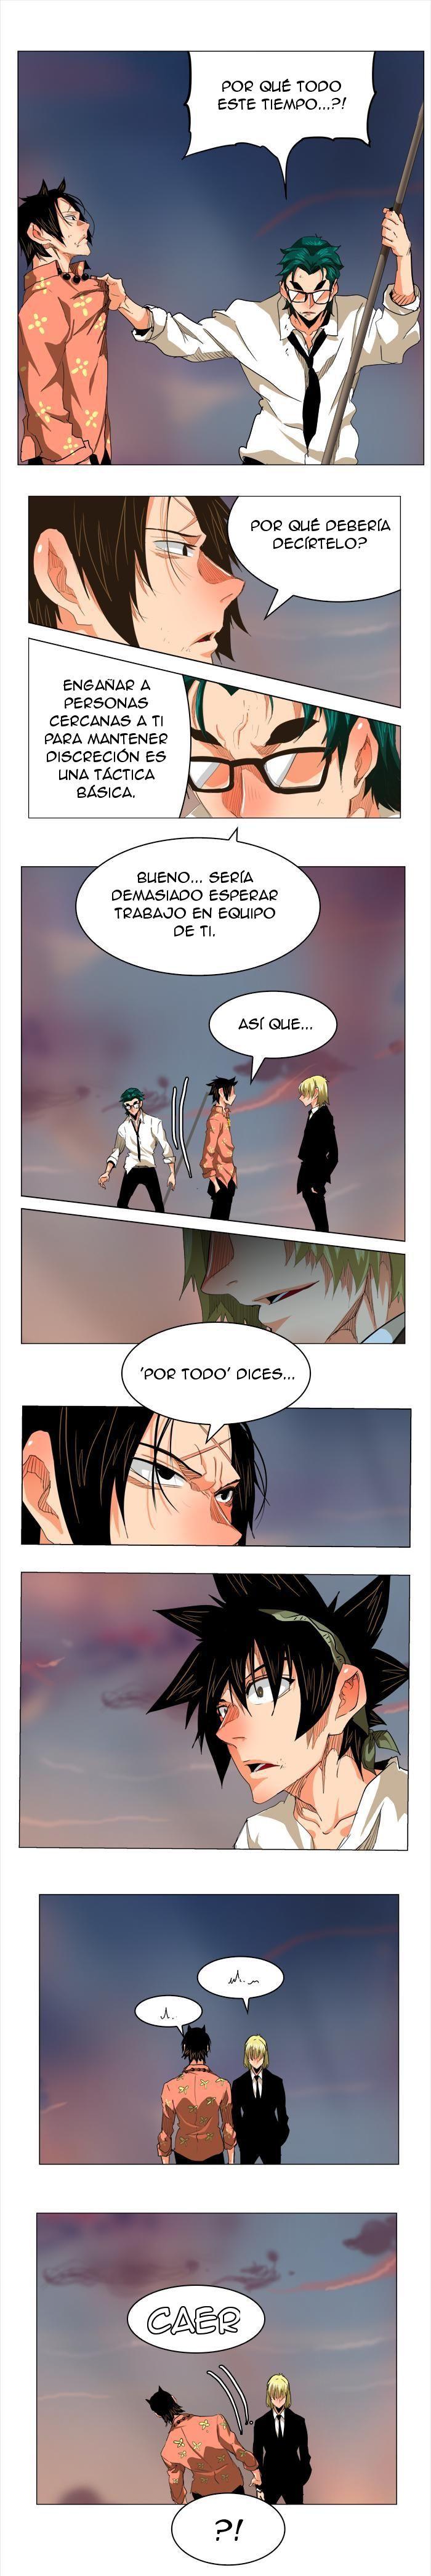 http://c5.ninemanga.com/es_manga/37/485/487894/8d80b953e6dab669d98c905f7527fedd.jpg Page 4